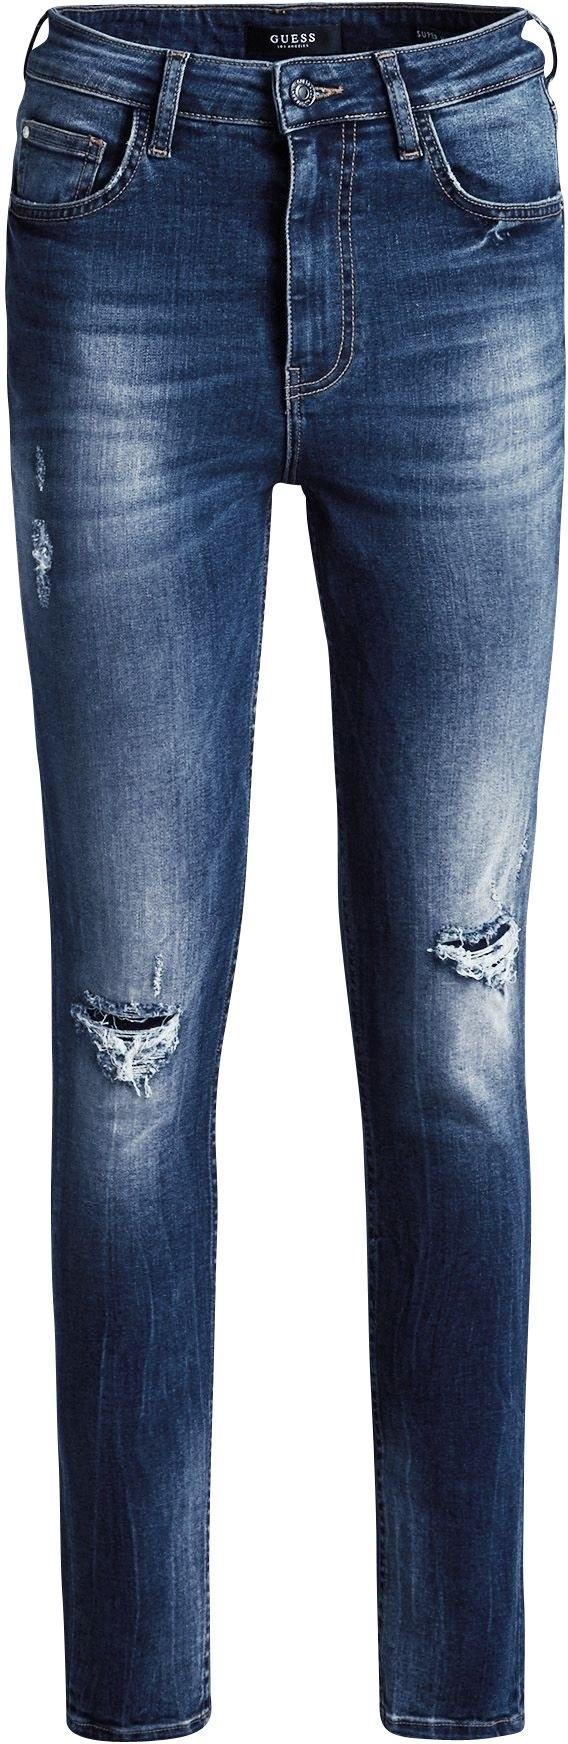 Online Kopen Waist Nu Guess Jeans High vnm8wPyN0O